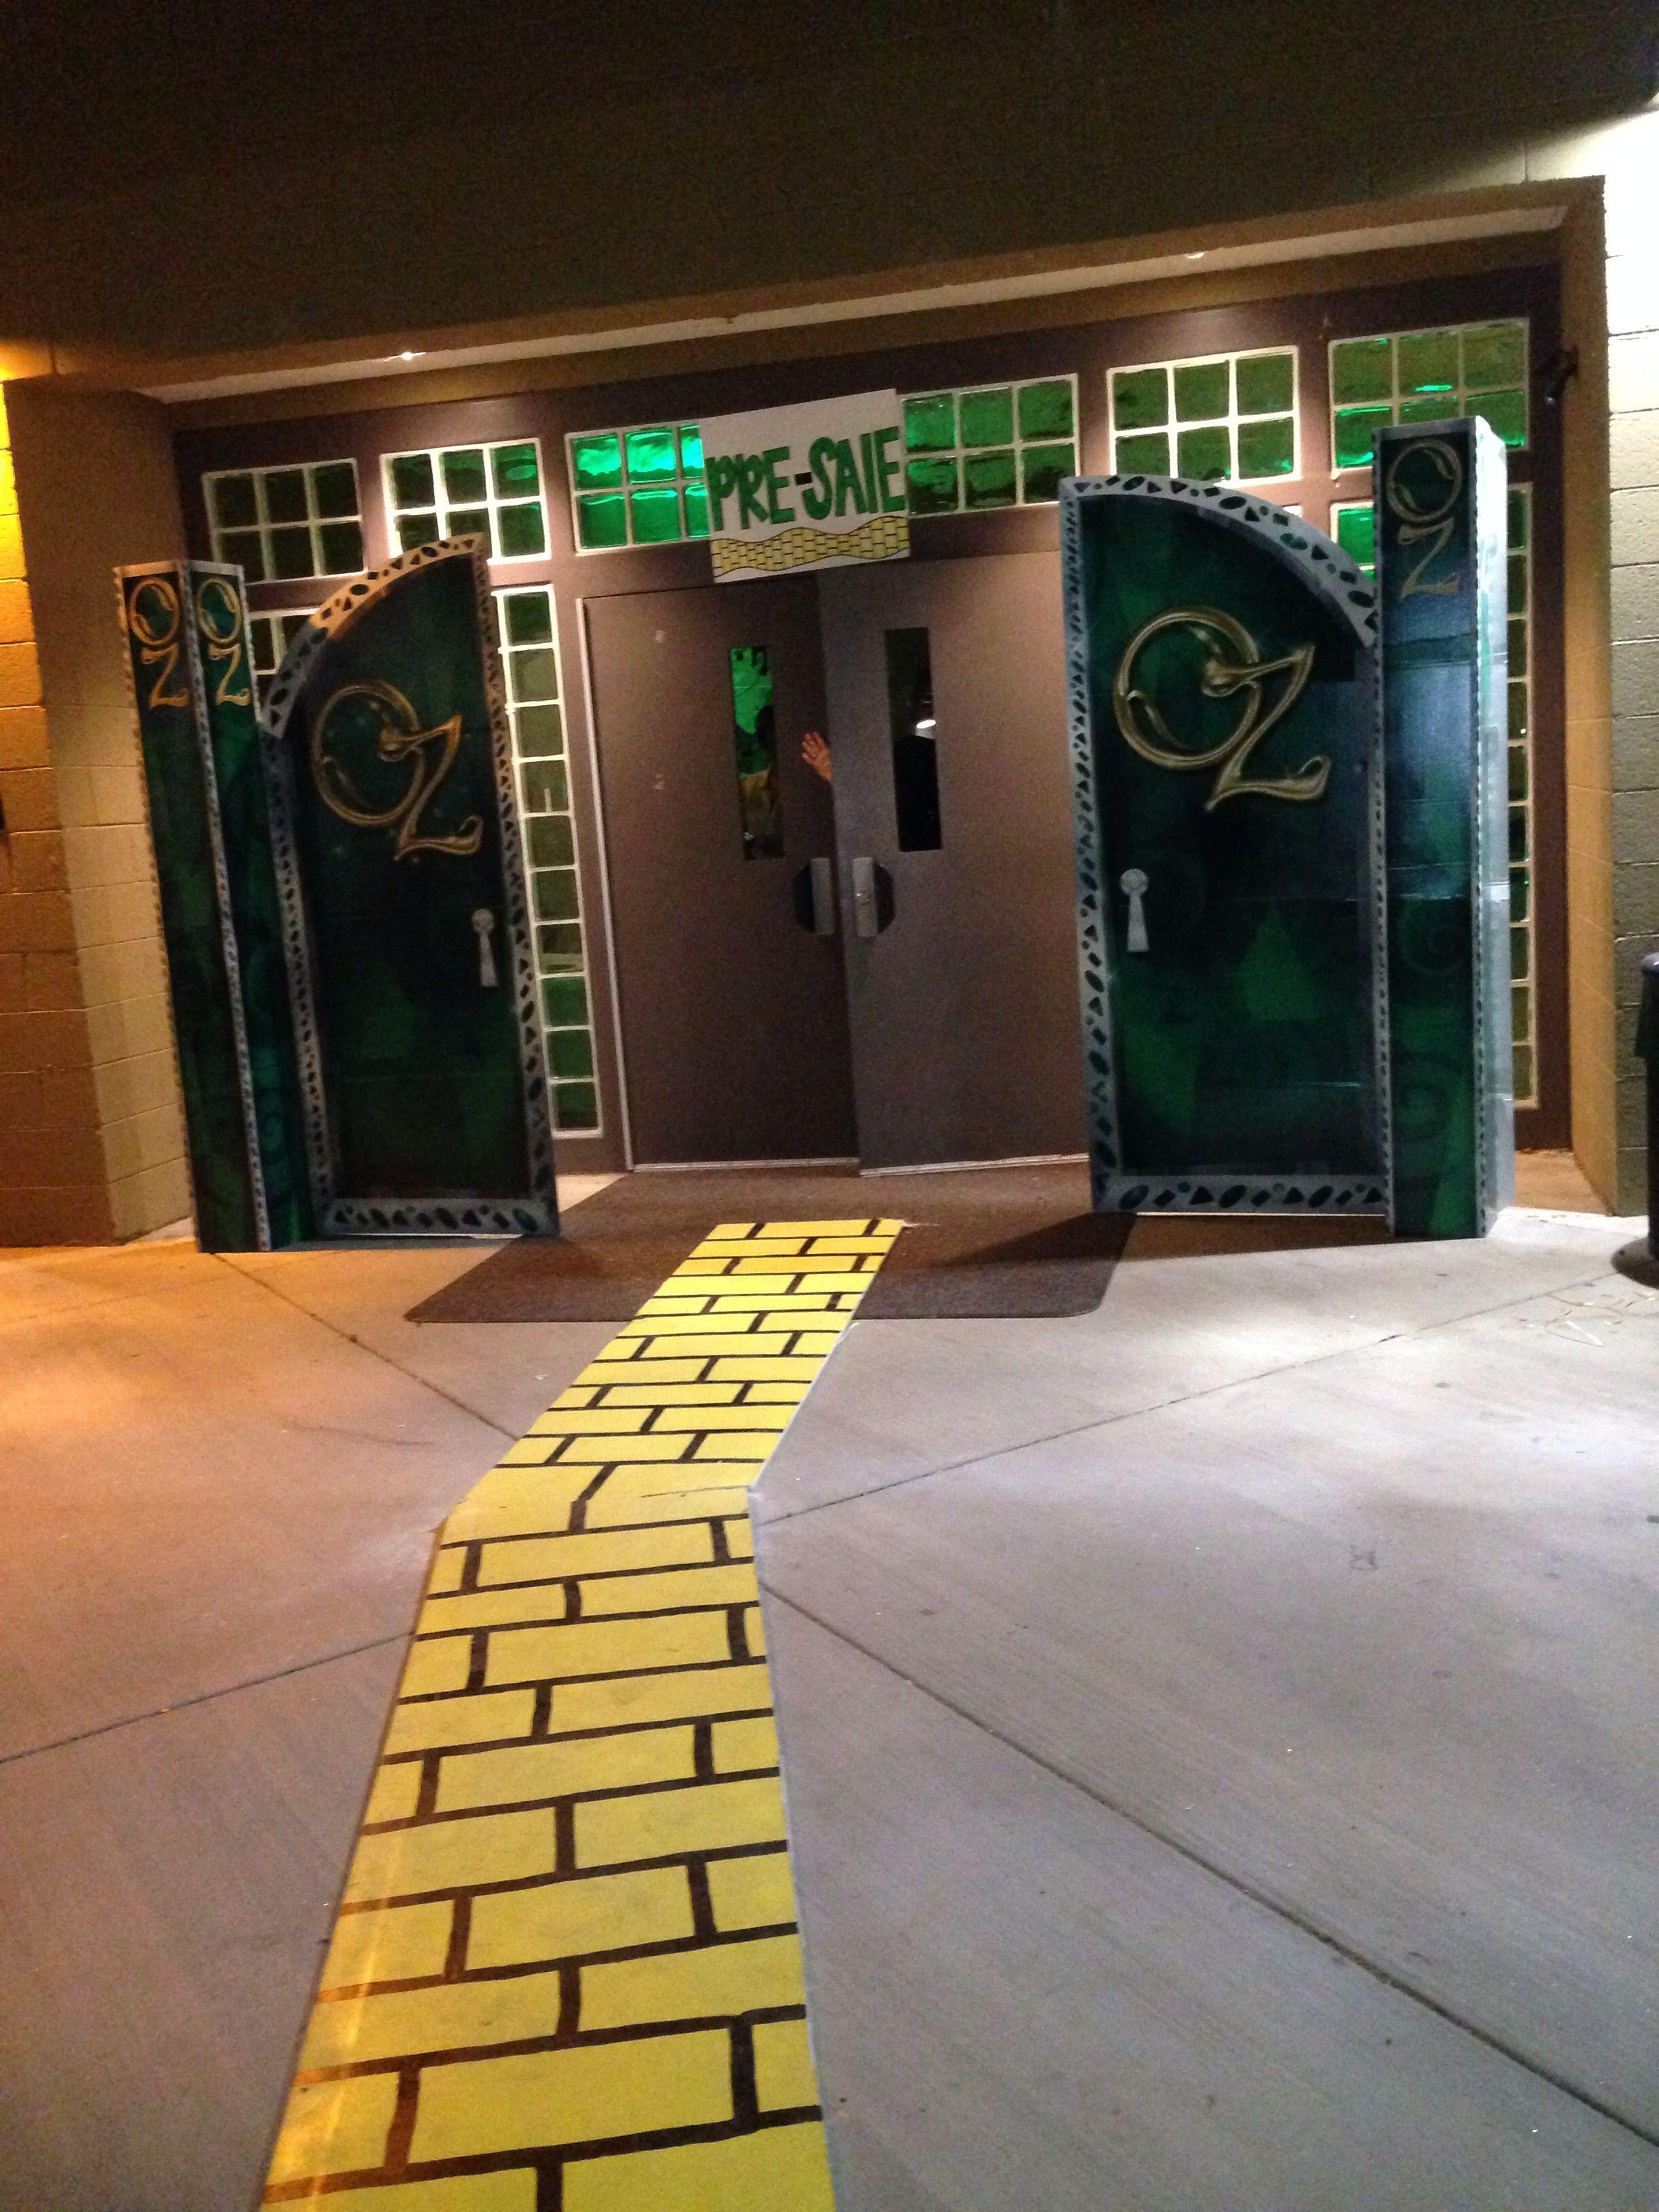 Wizard of oz spirit week theme with Oz doors